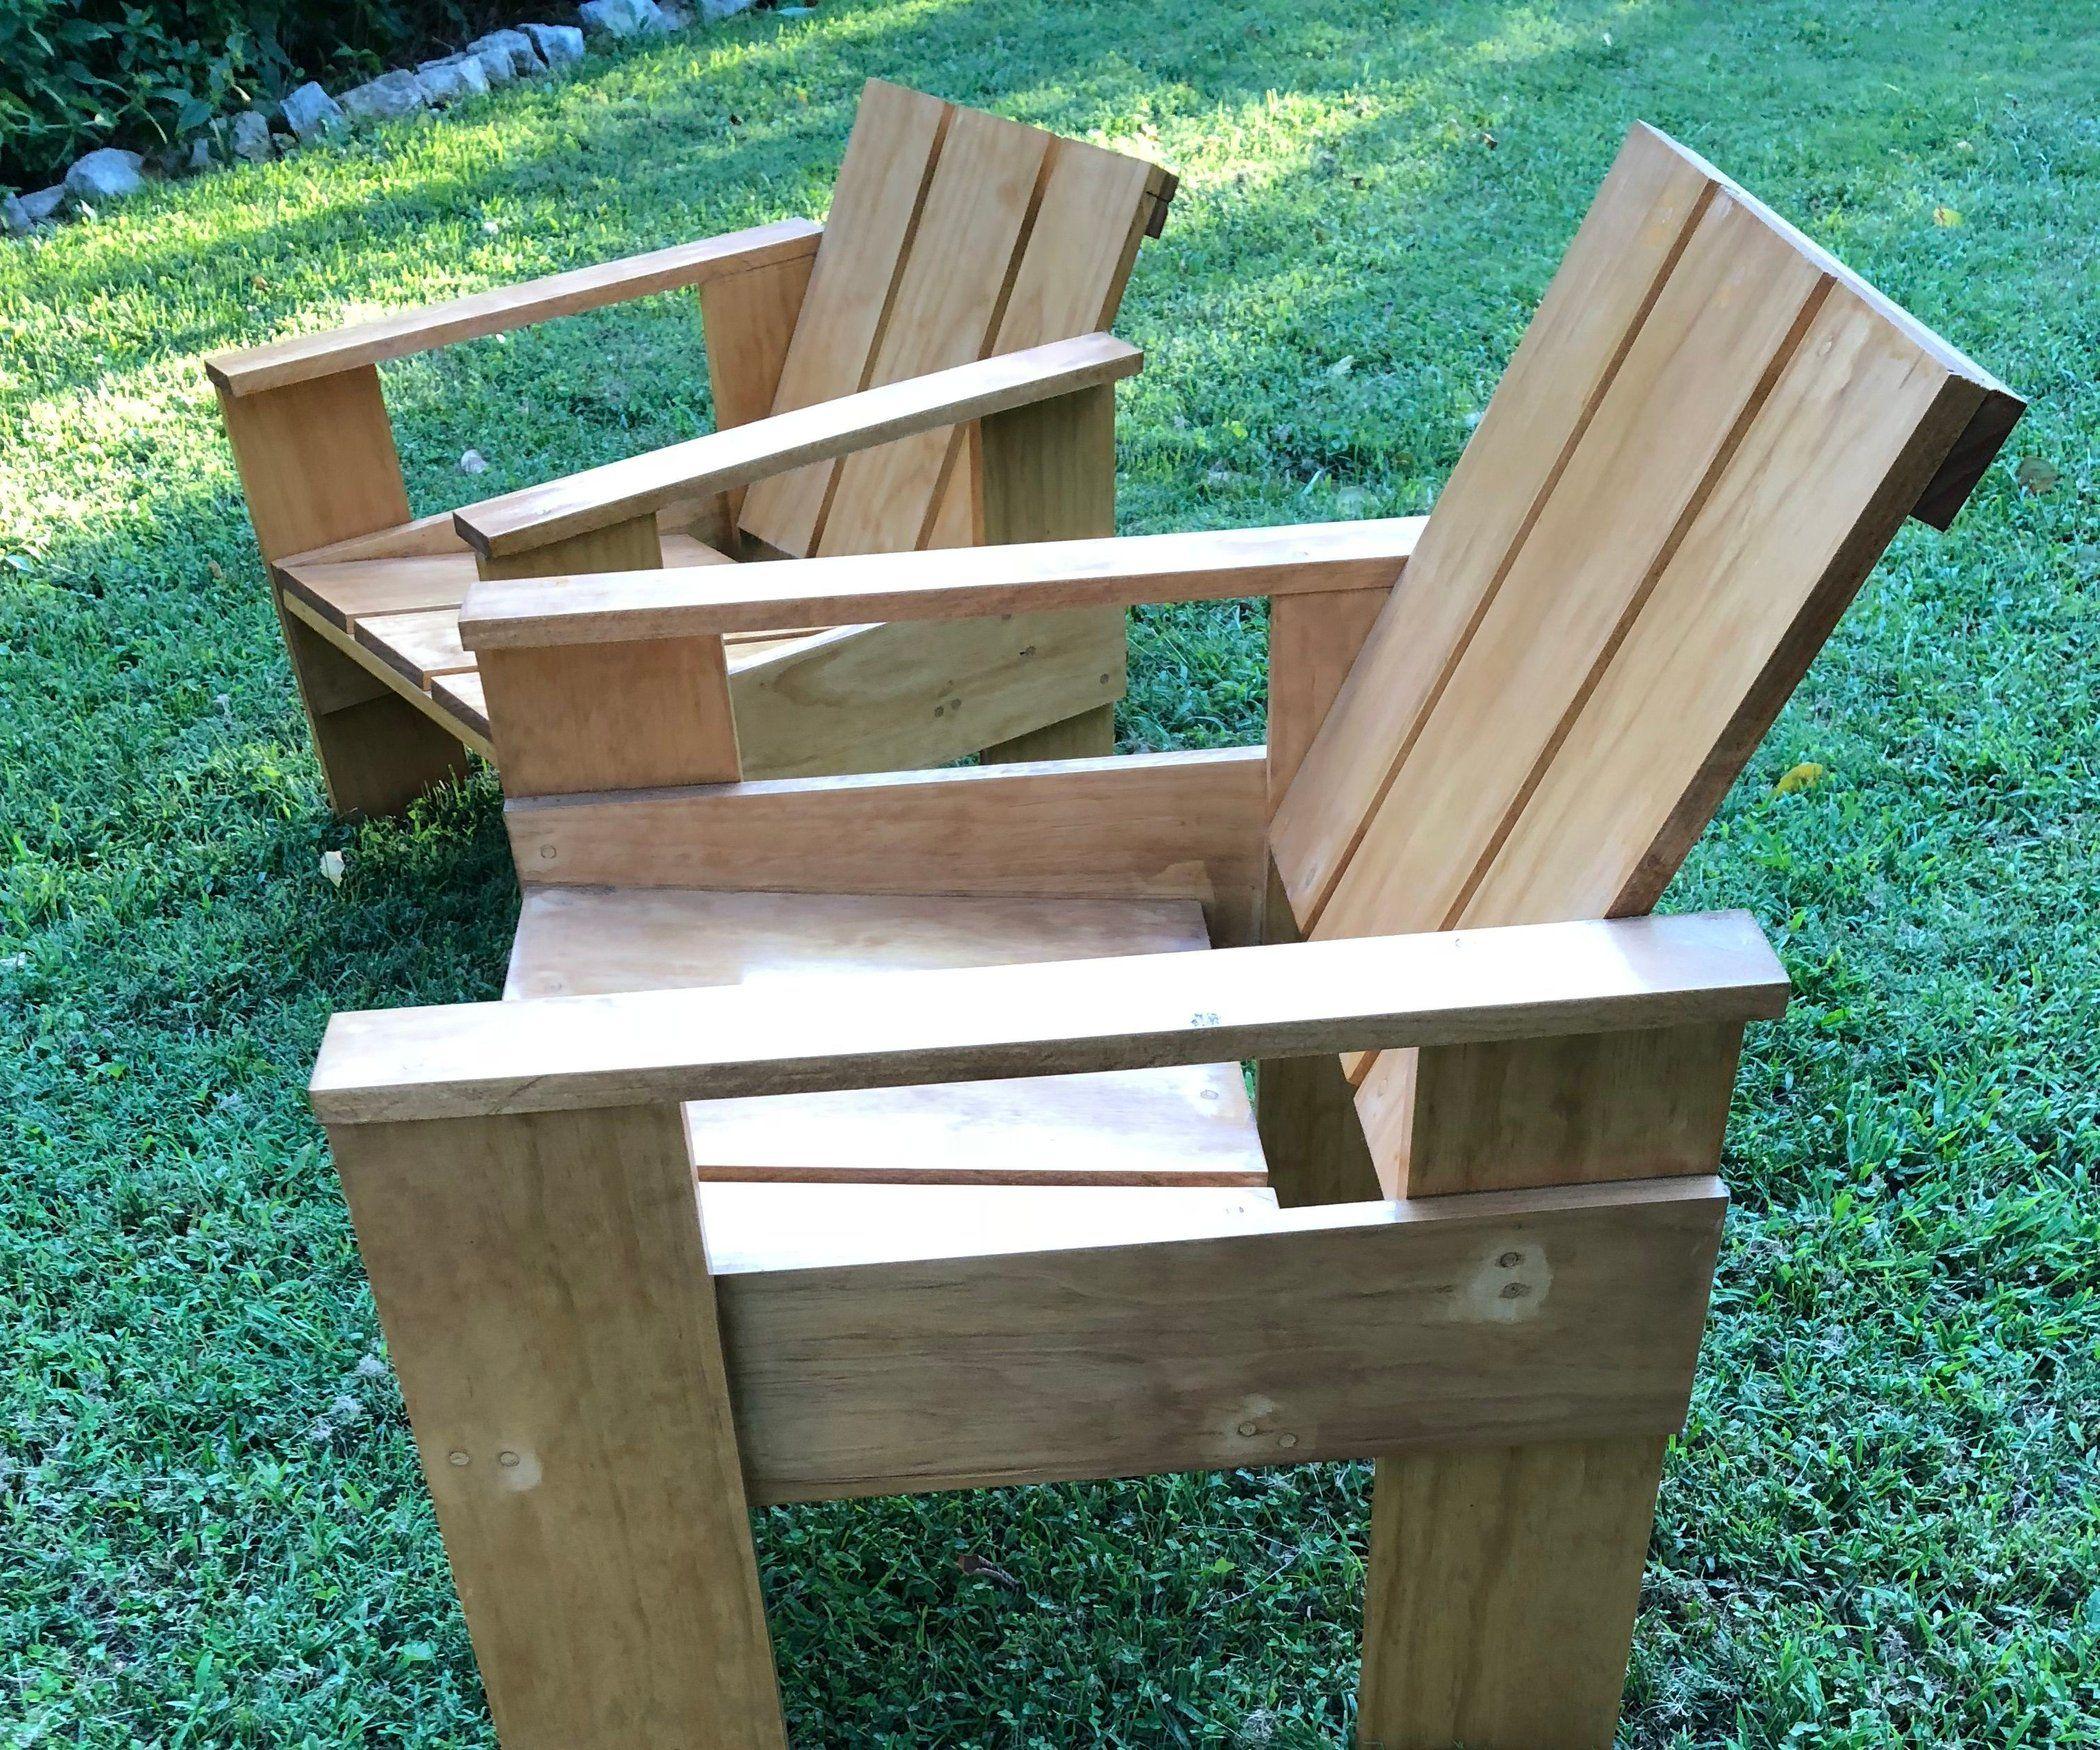 Gerrit Rietveld Crate Chair Vintage Chair Diy Dutch Furniture